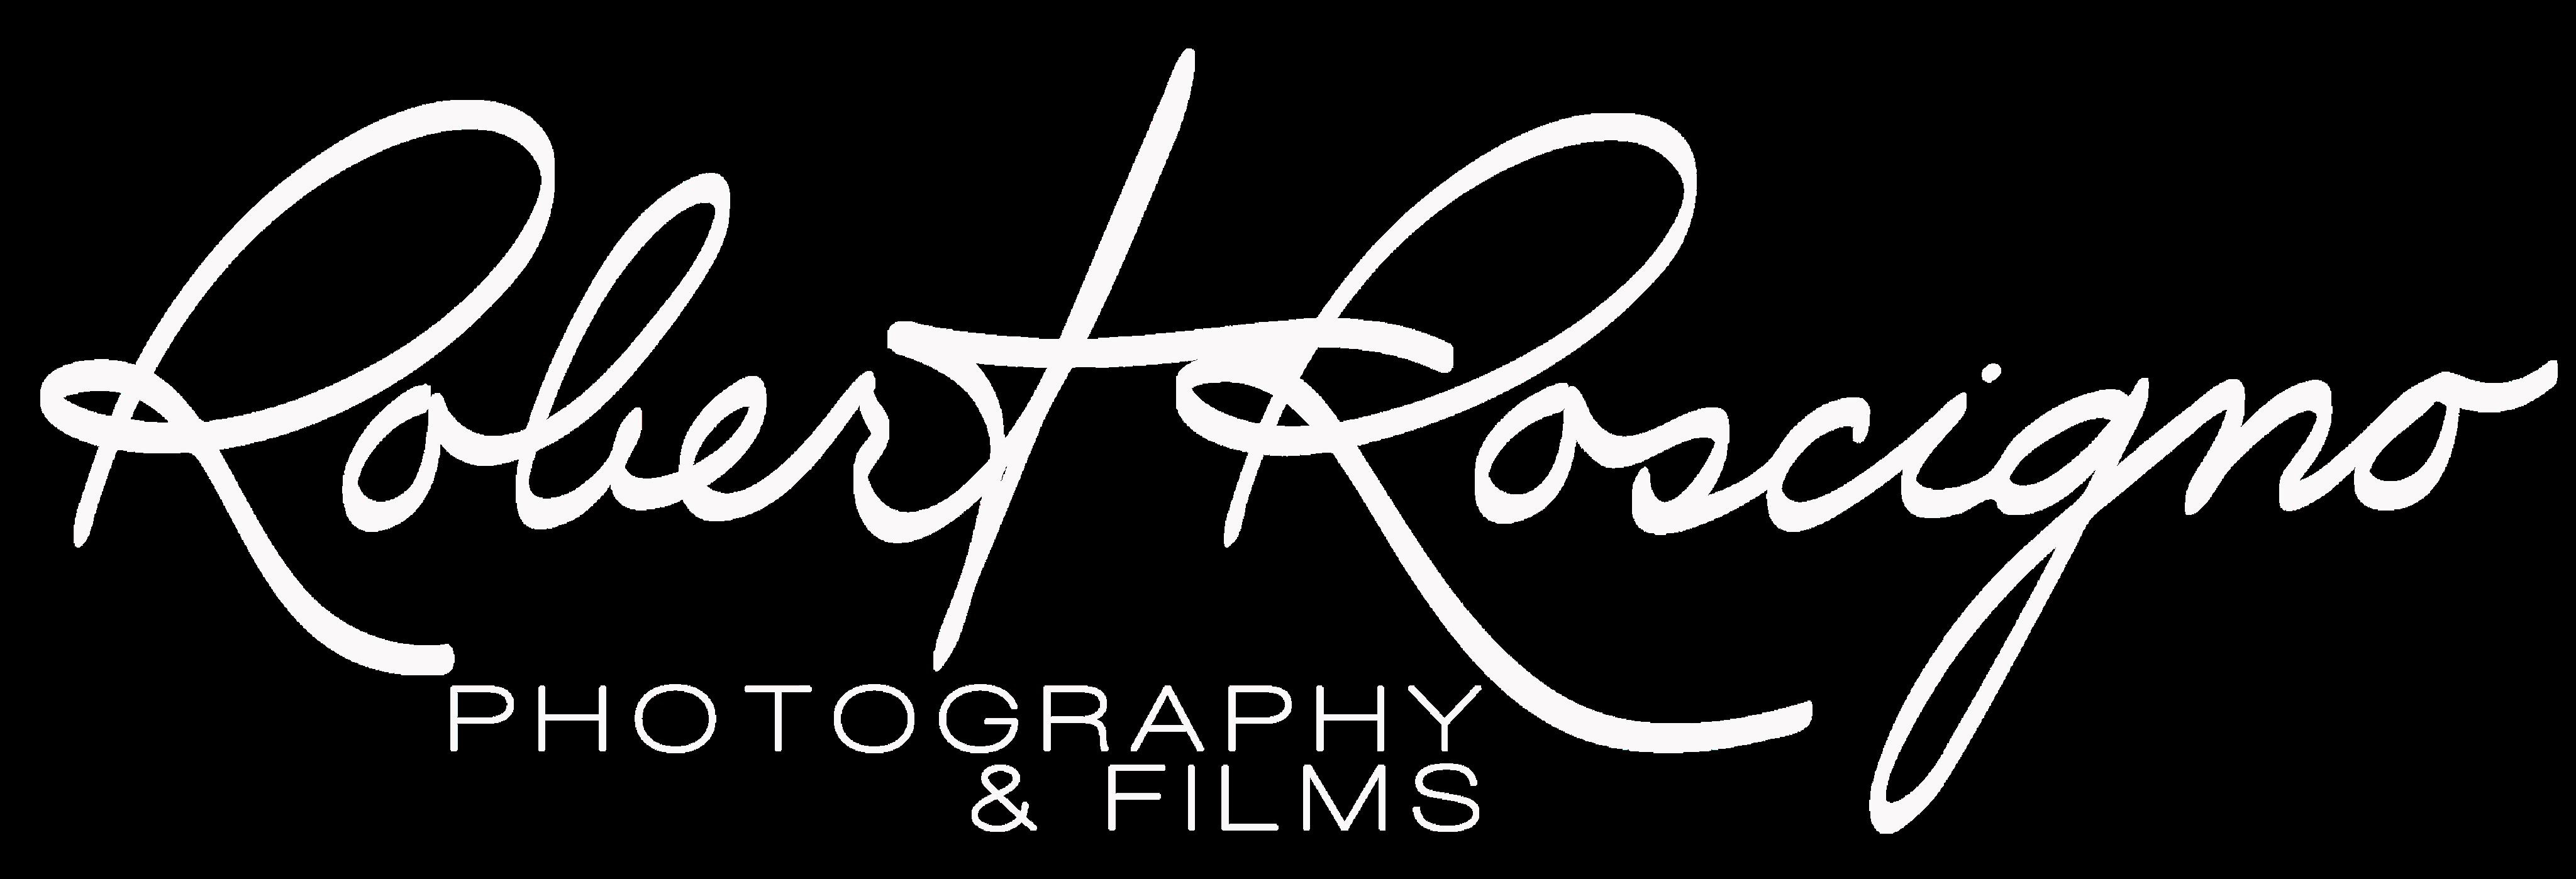 Robert Roscigno